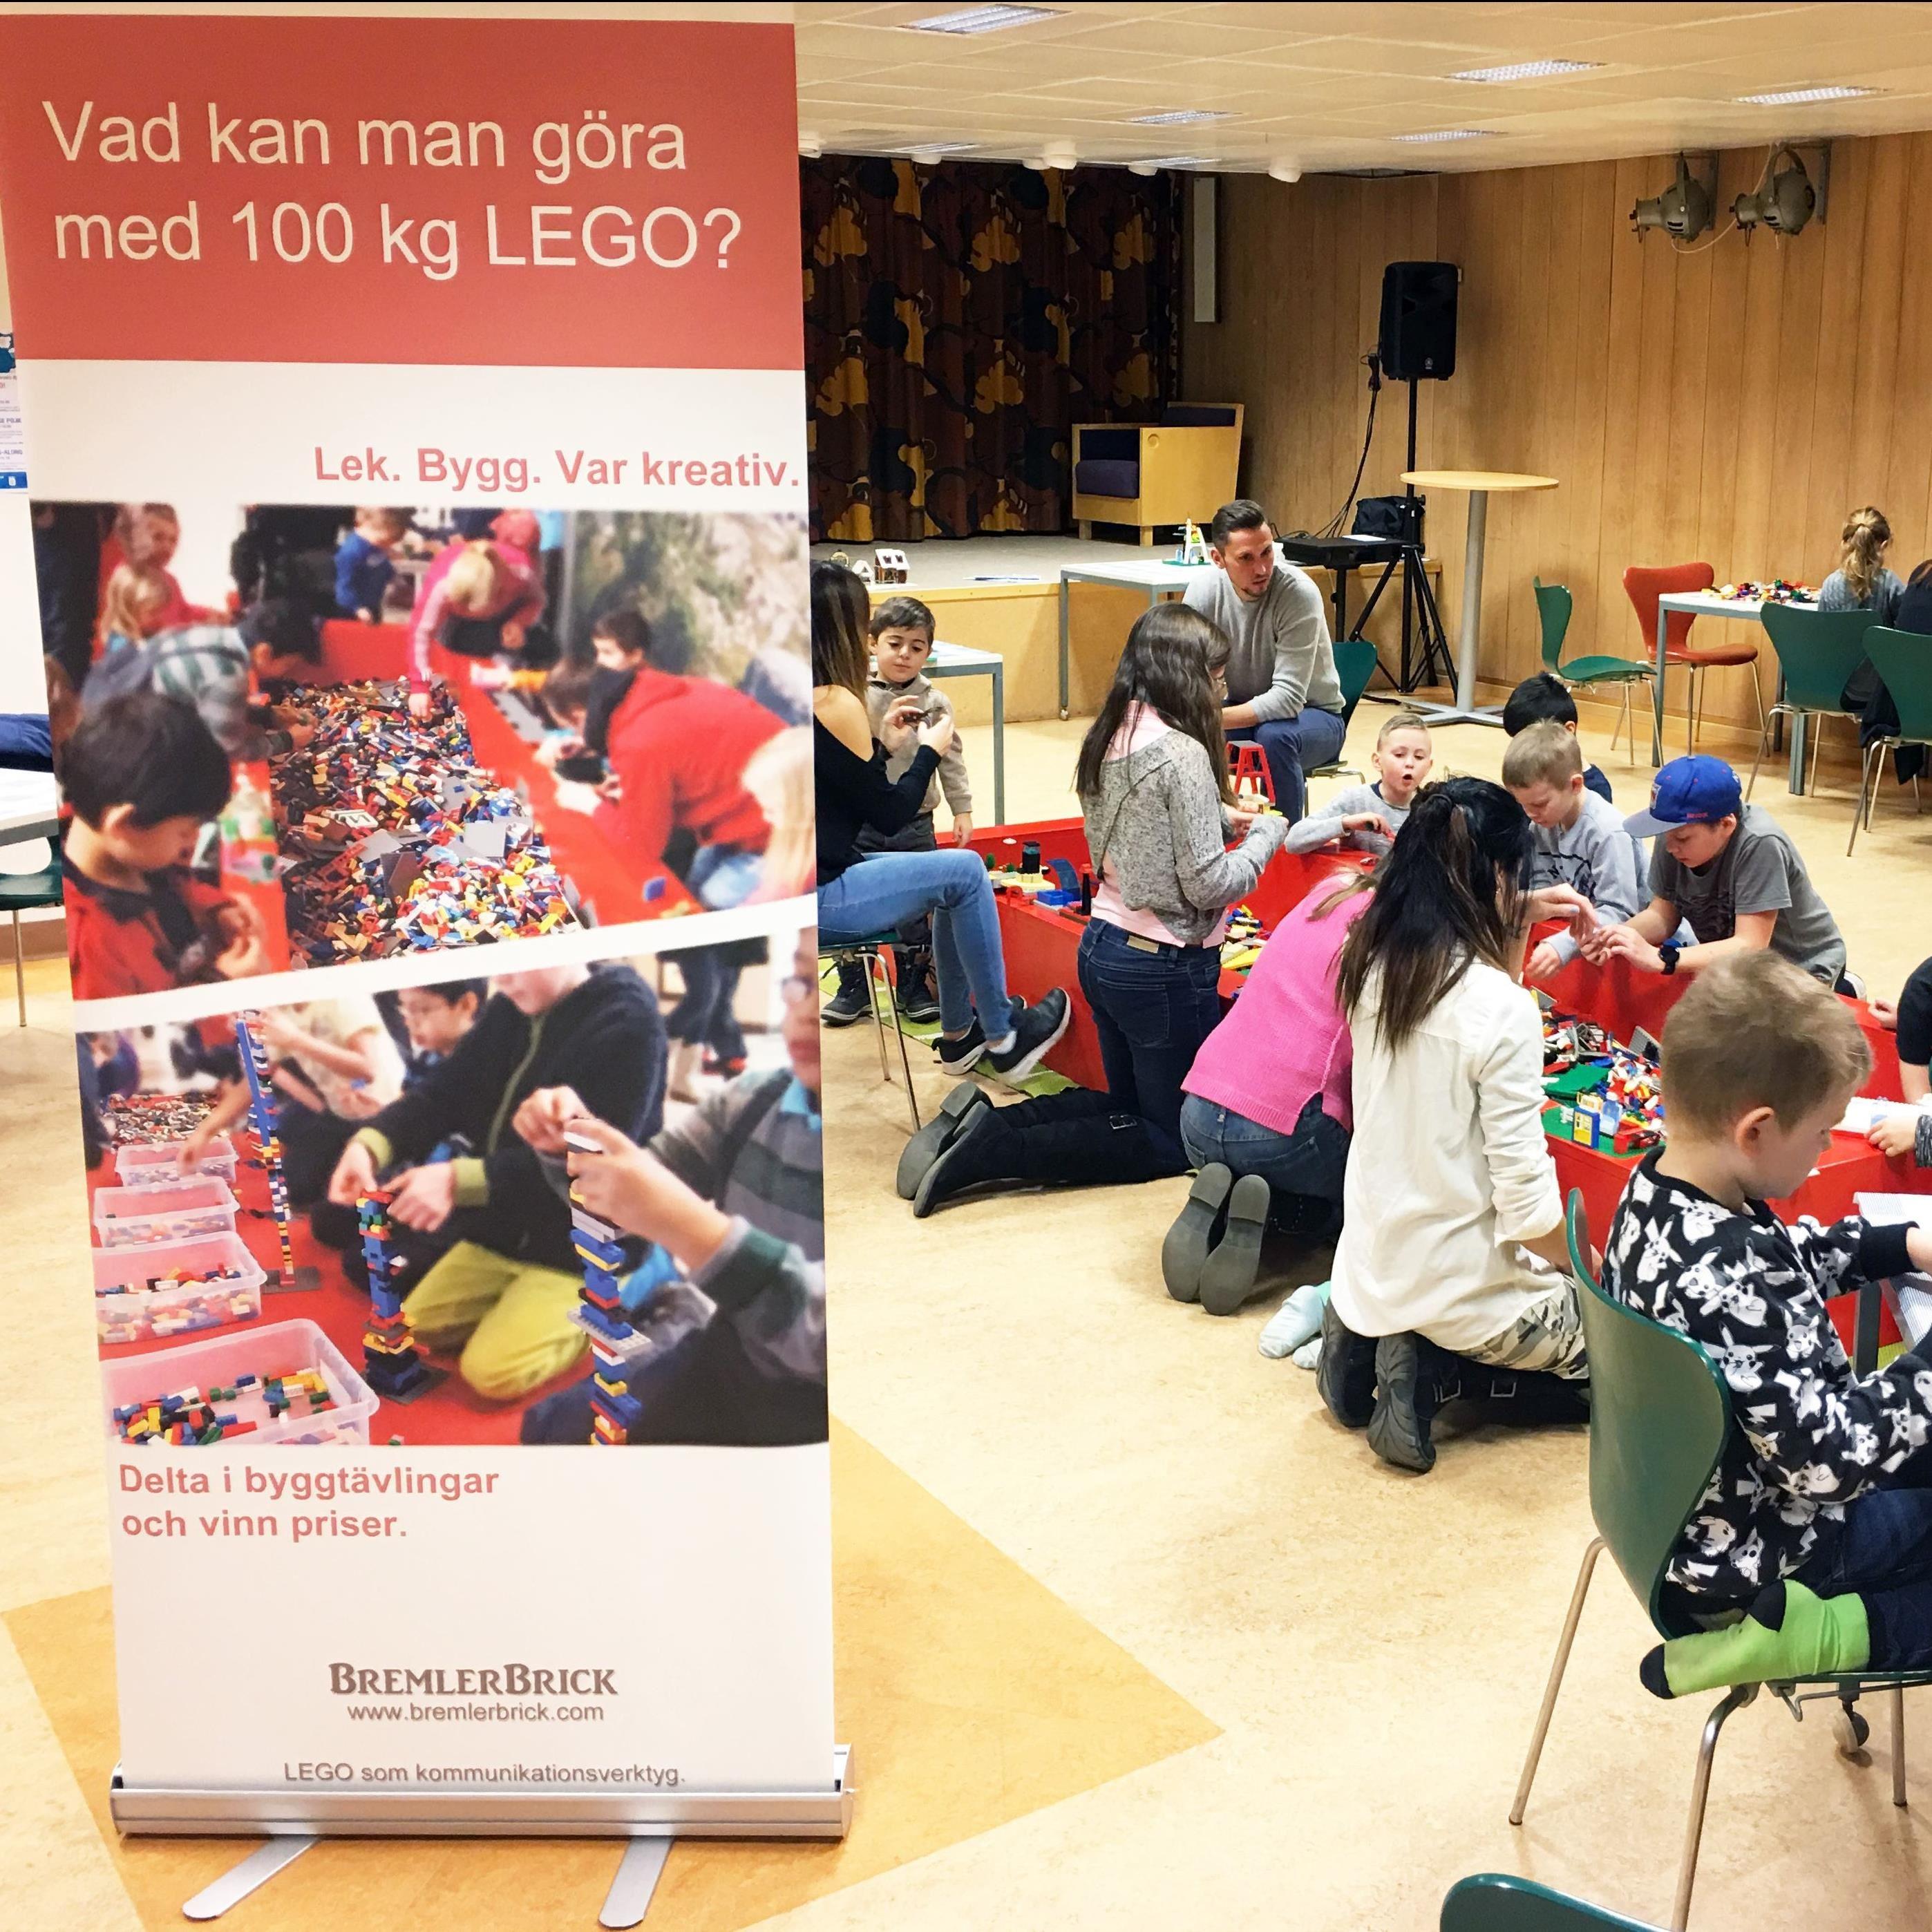 SOMMARLOV - Legoevent i Nässjö stadsbibliotek